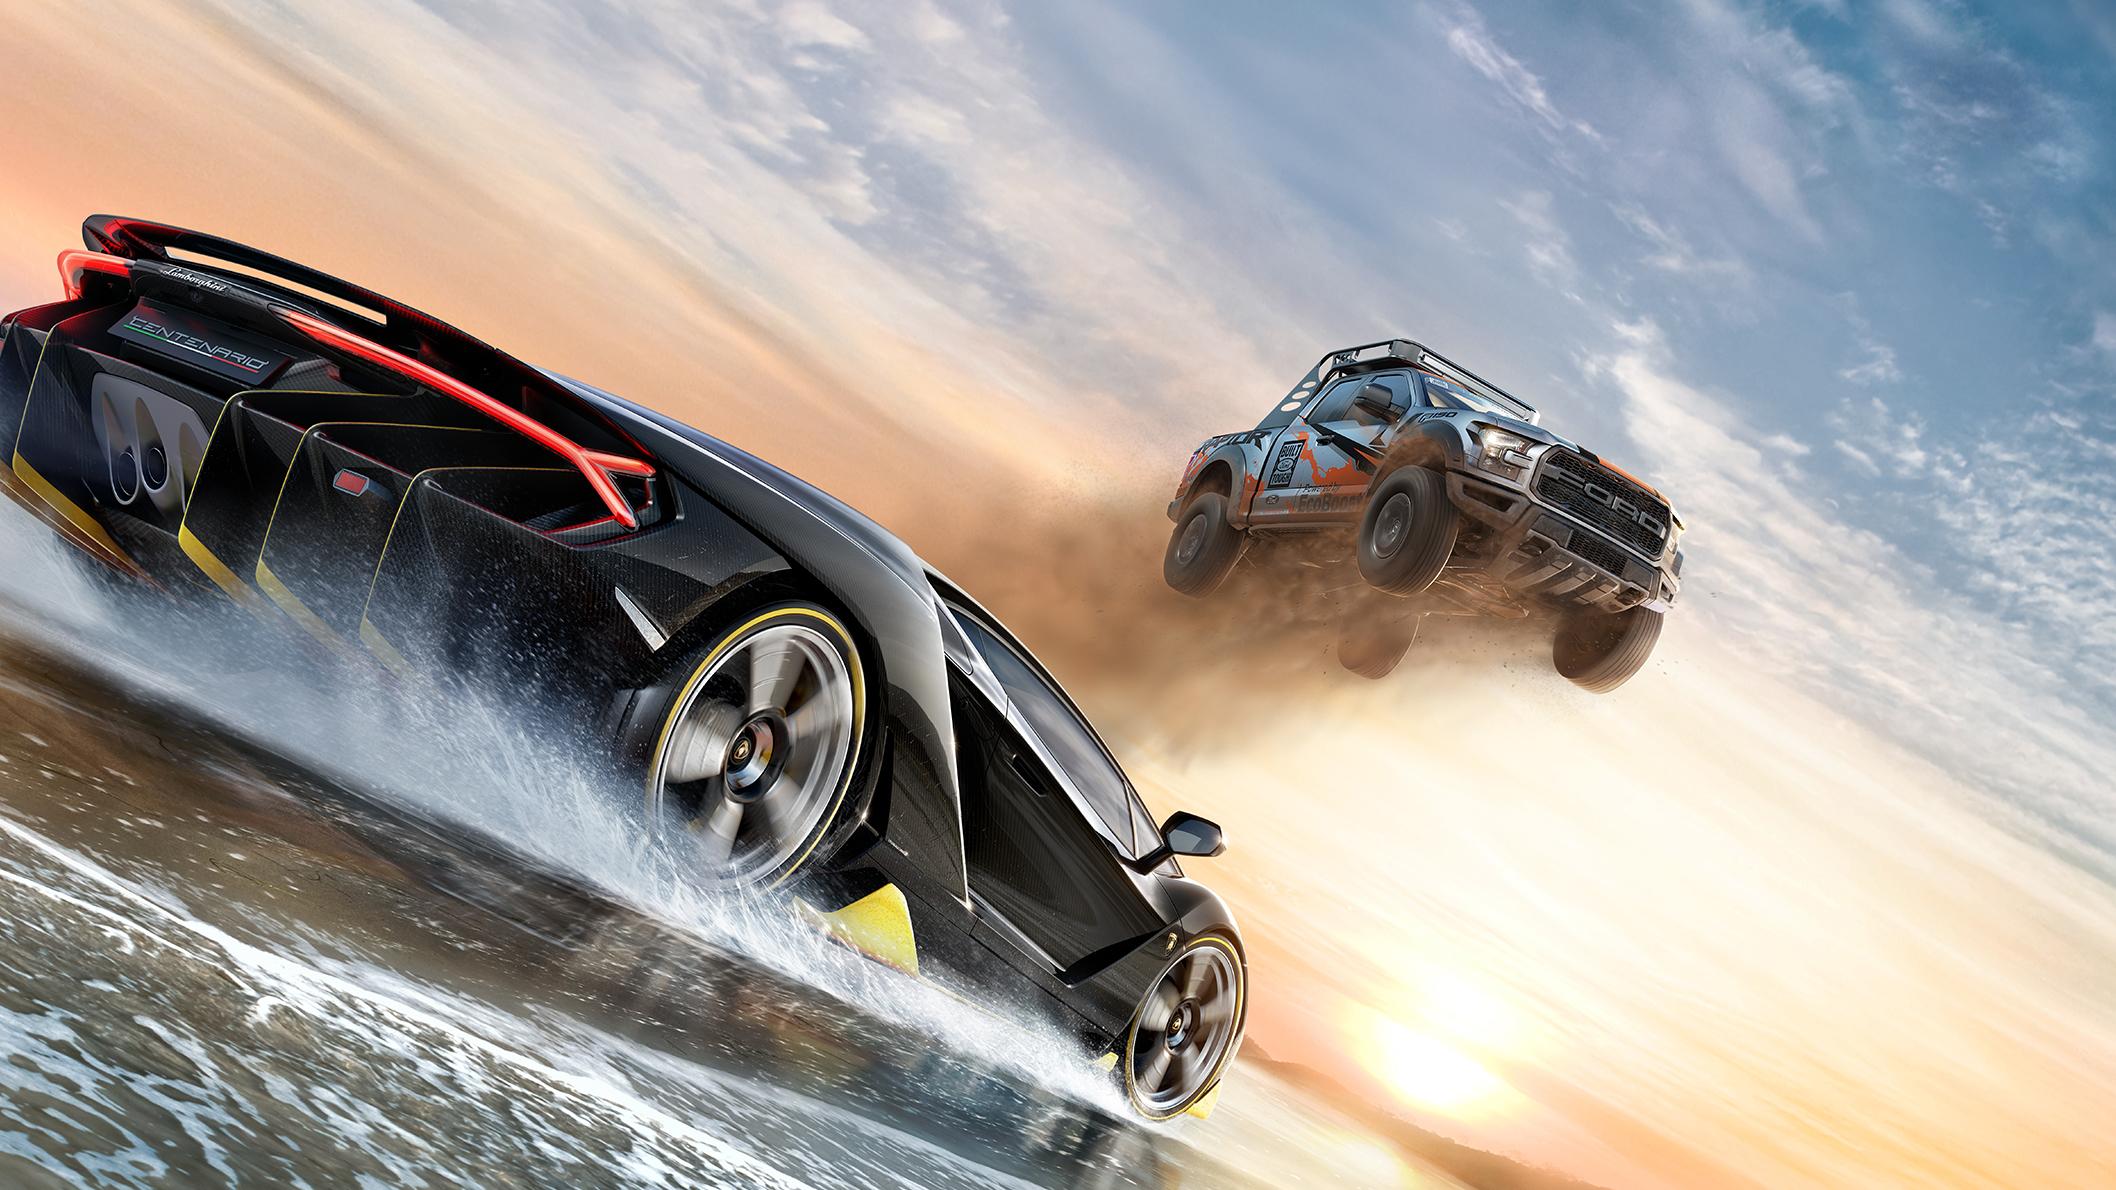 Buy Forza Horizon 3 for Xbox One - Microsoft Store